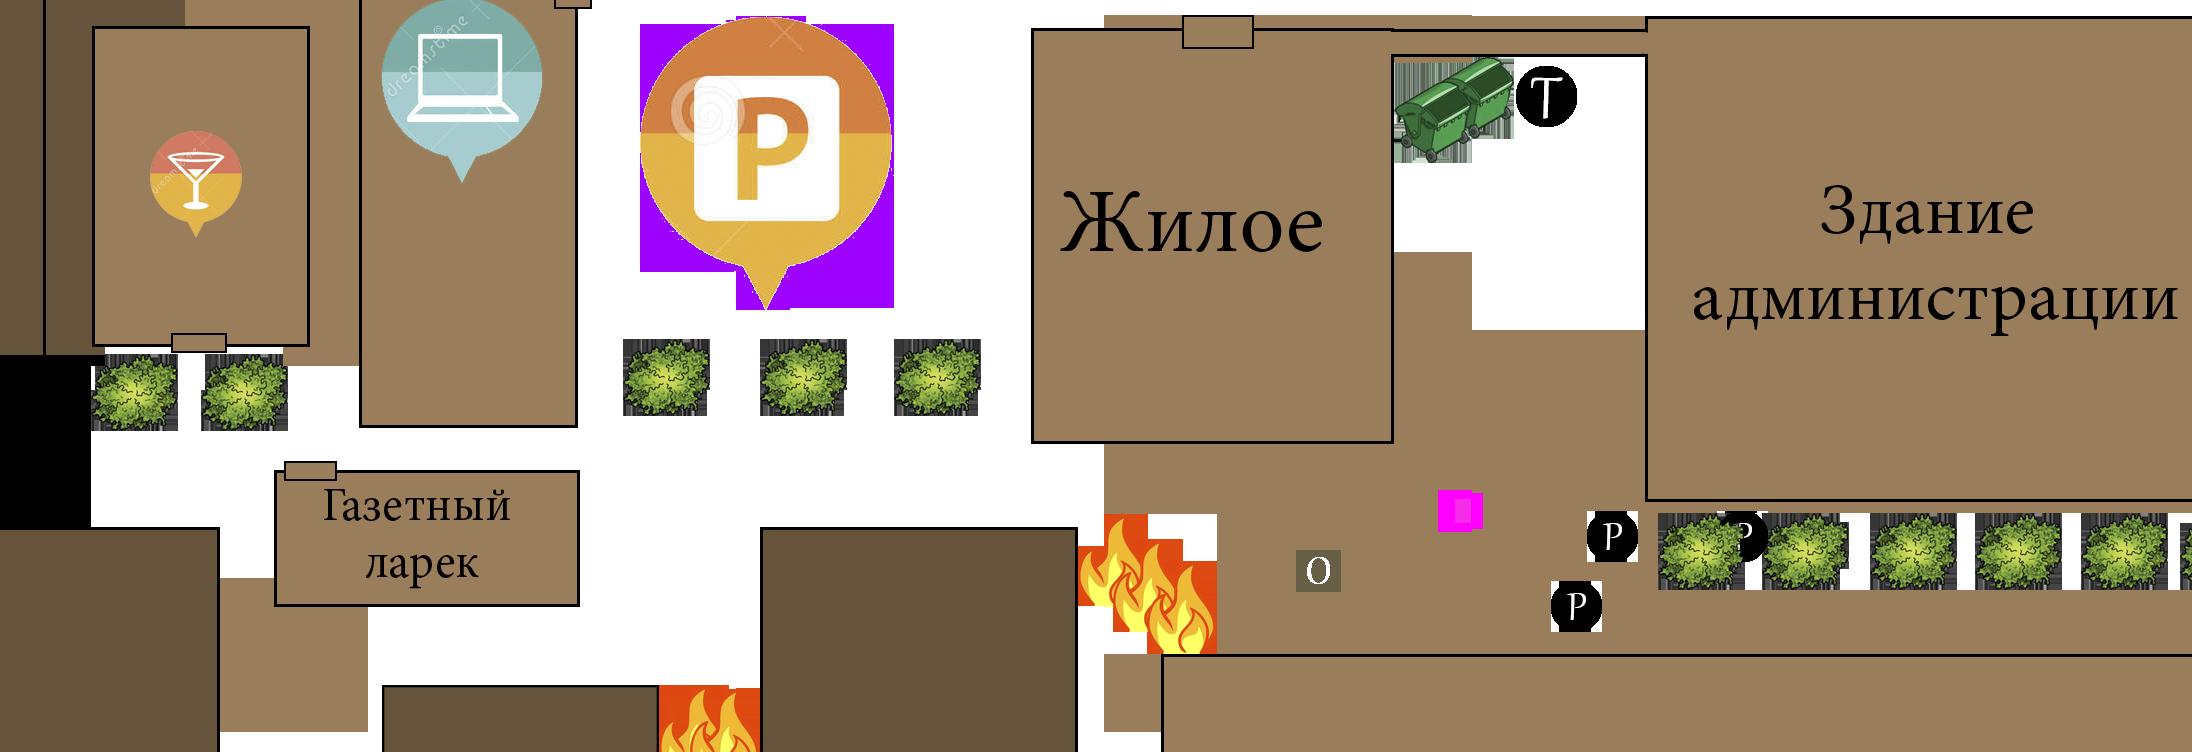 http://ipic.su/img/img7/fs/Kartanaemnikov.1438047551.png